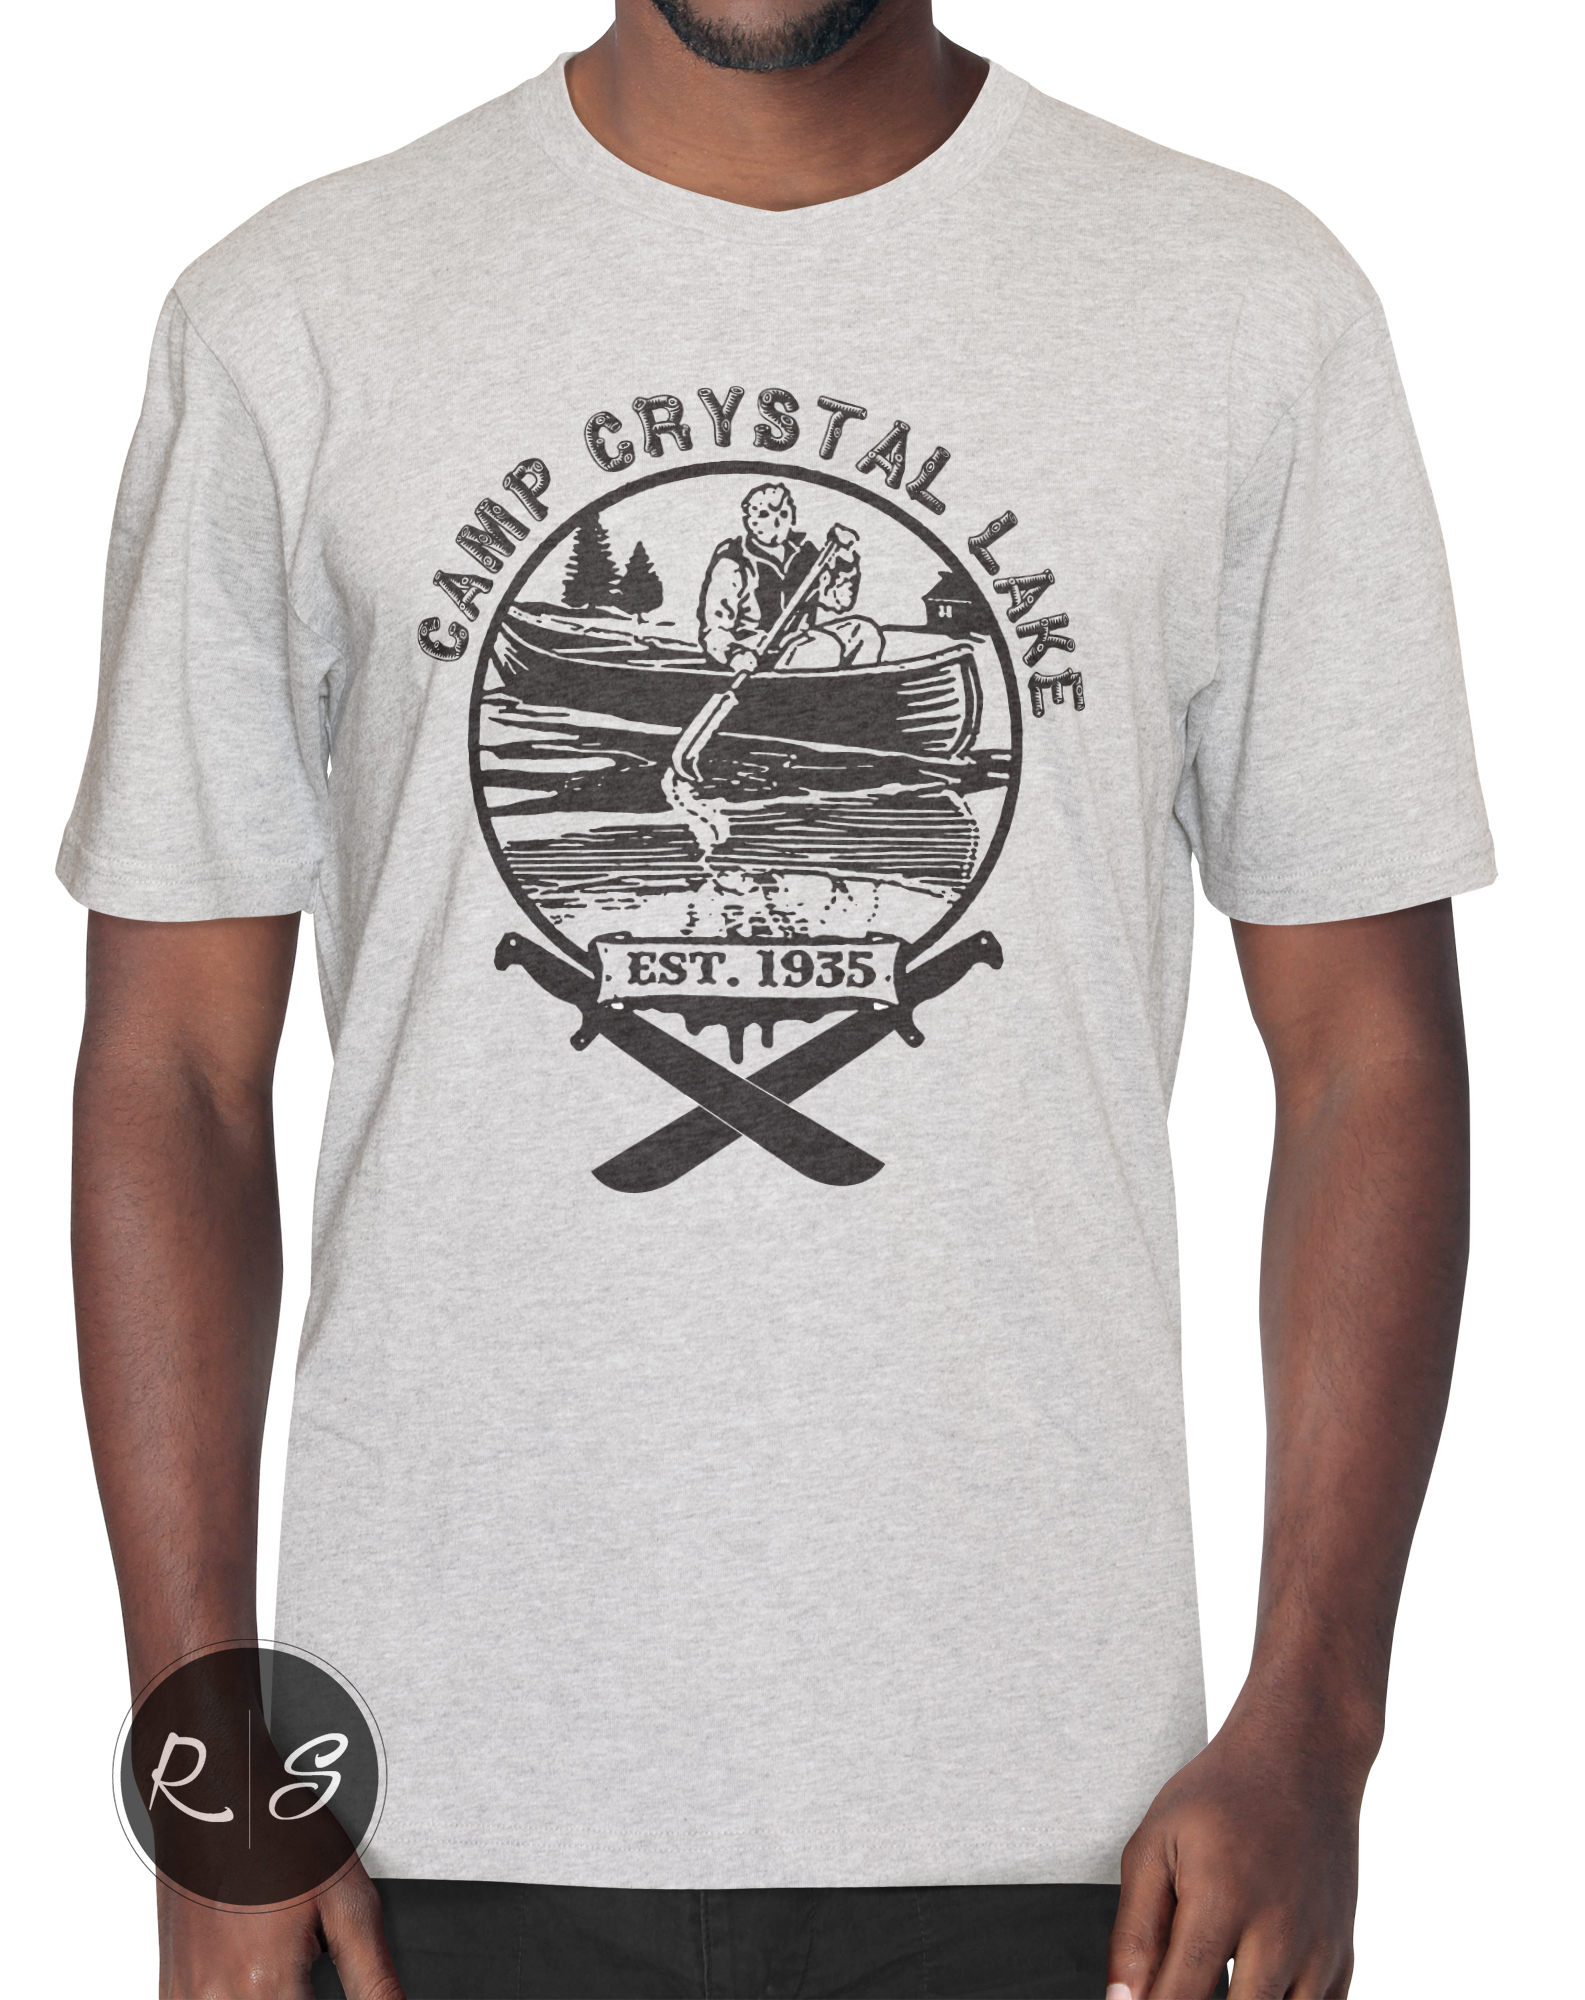 Camp Crystal Lake T-Shirt - Shot6